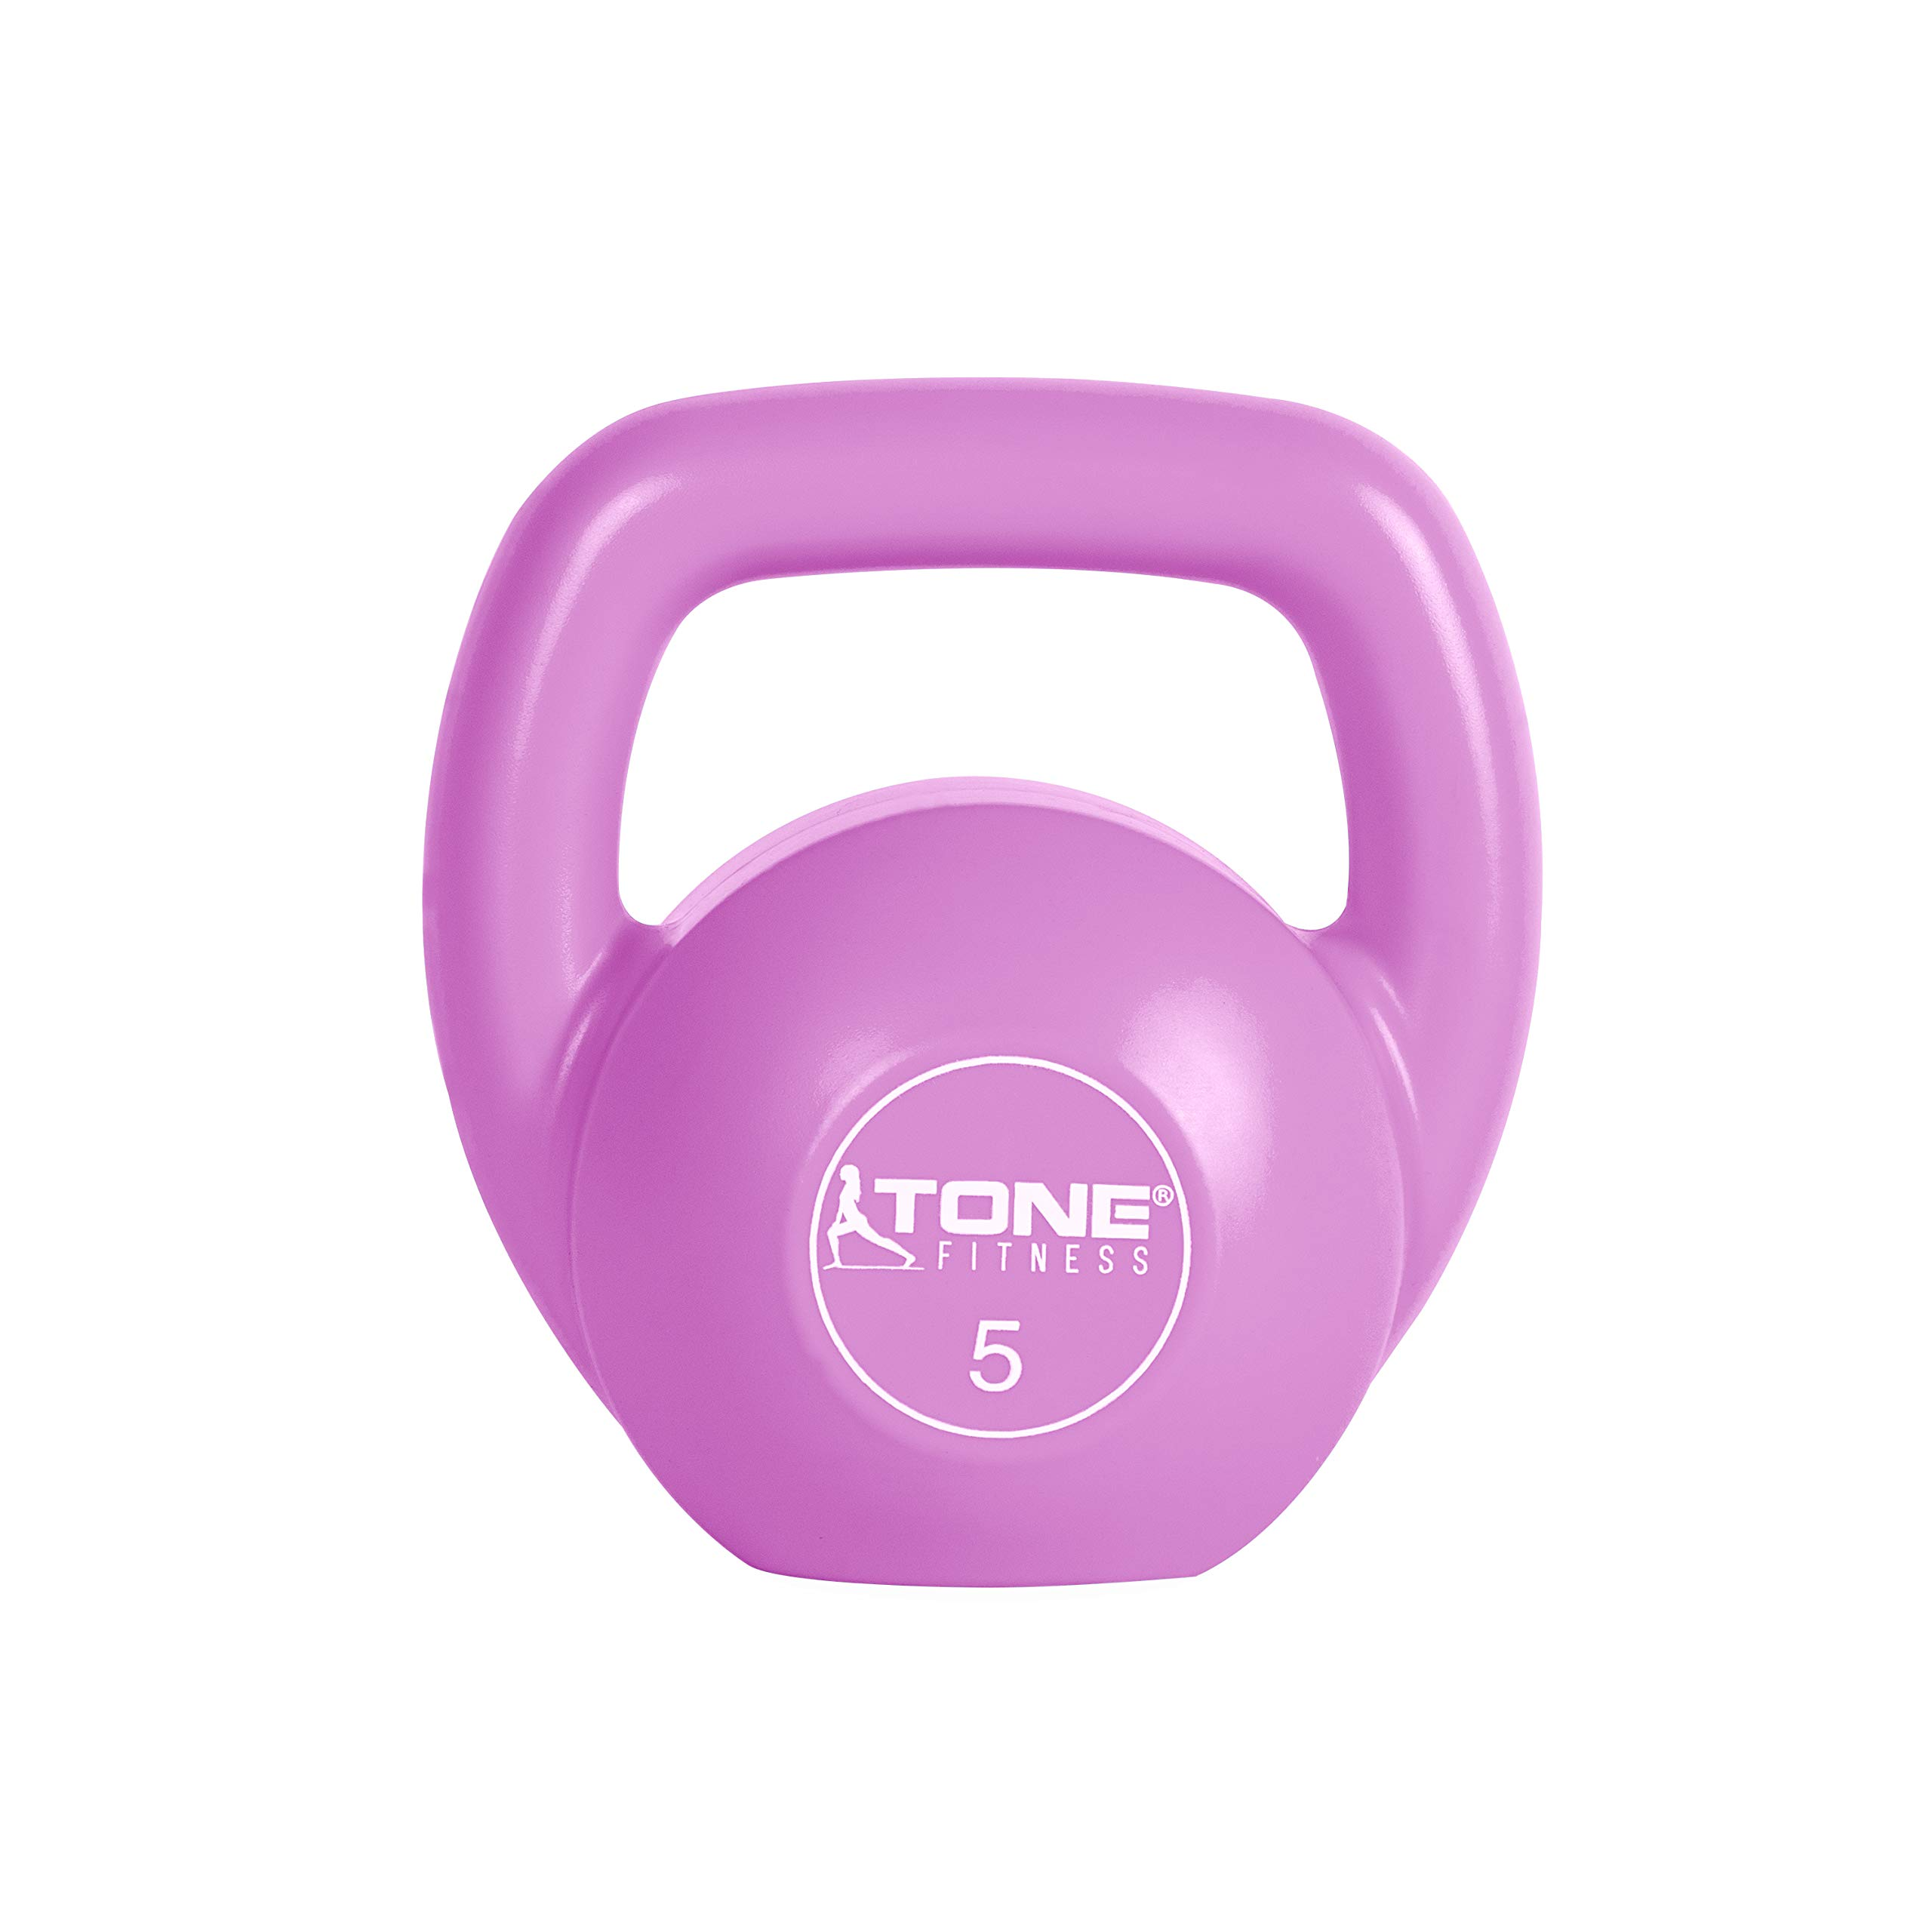 Tone Fitness Vinyl Kettlebell, 5-Pound, Pink